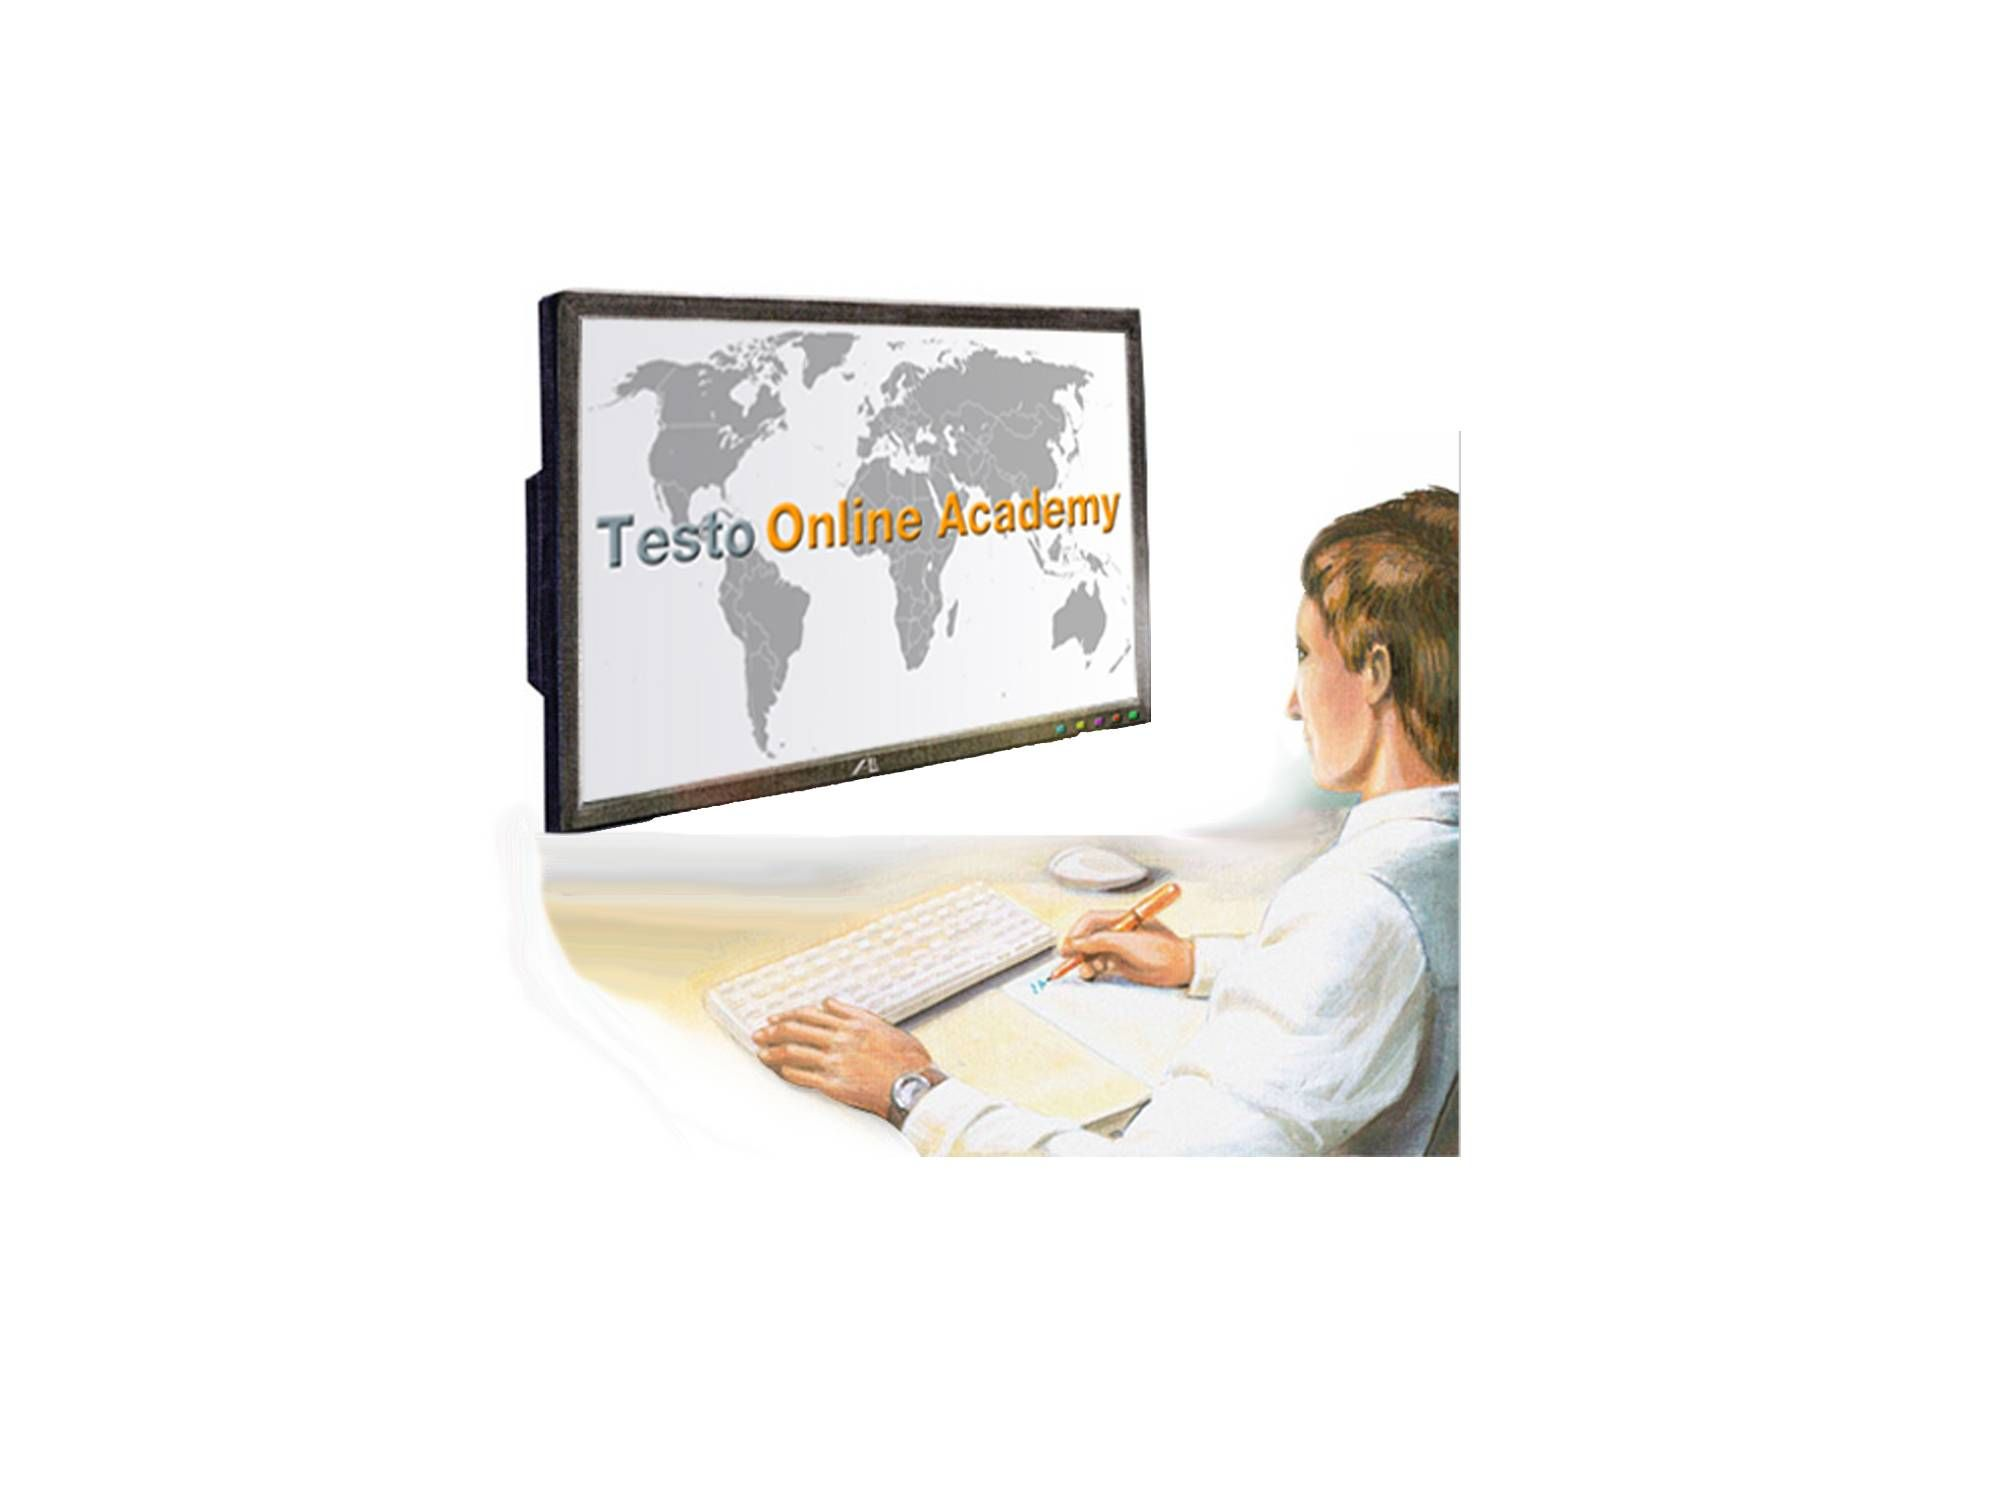 testo-online-akademie-fuer-haendler.jpg